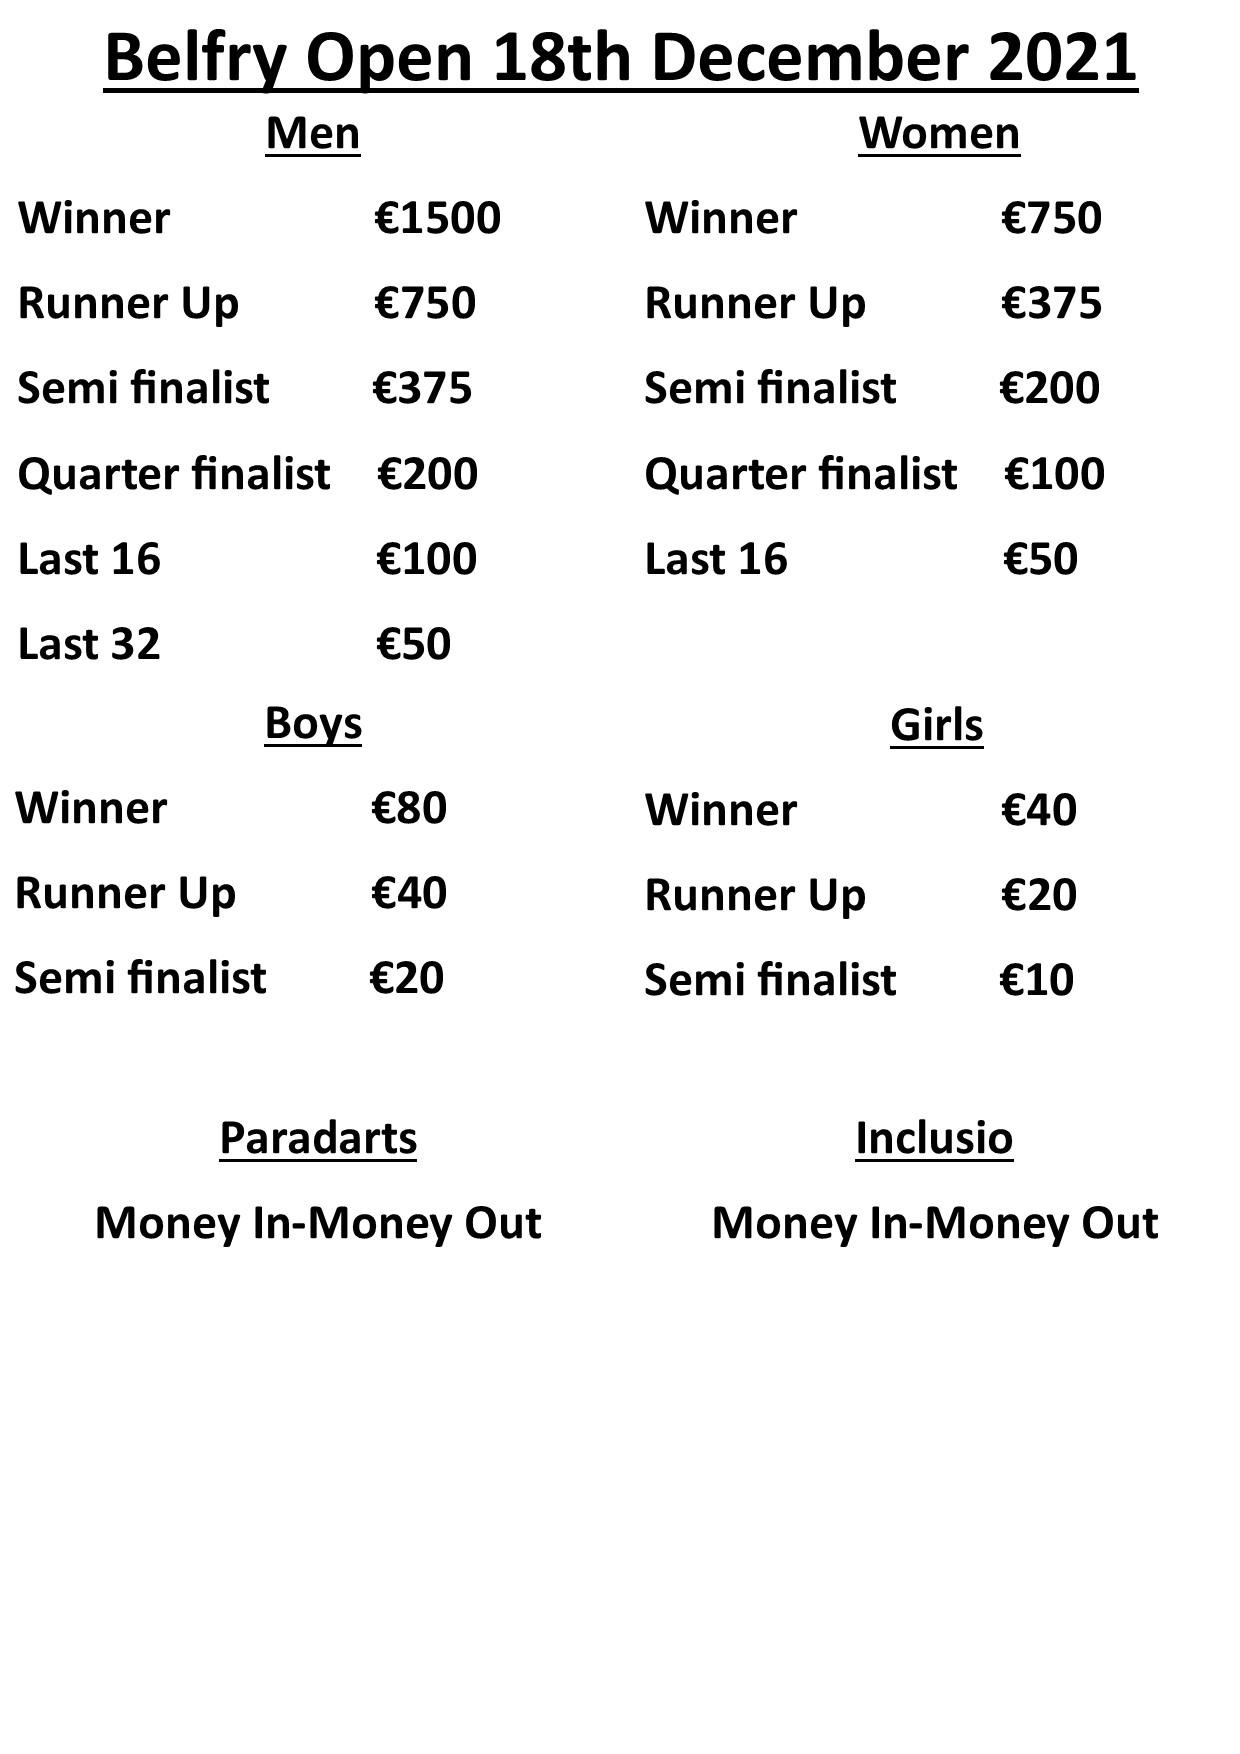 Prize Money Belfry Open 2021